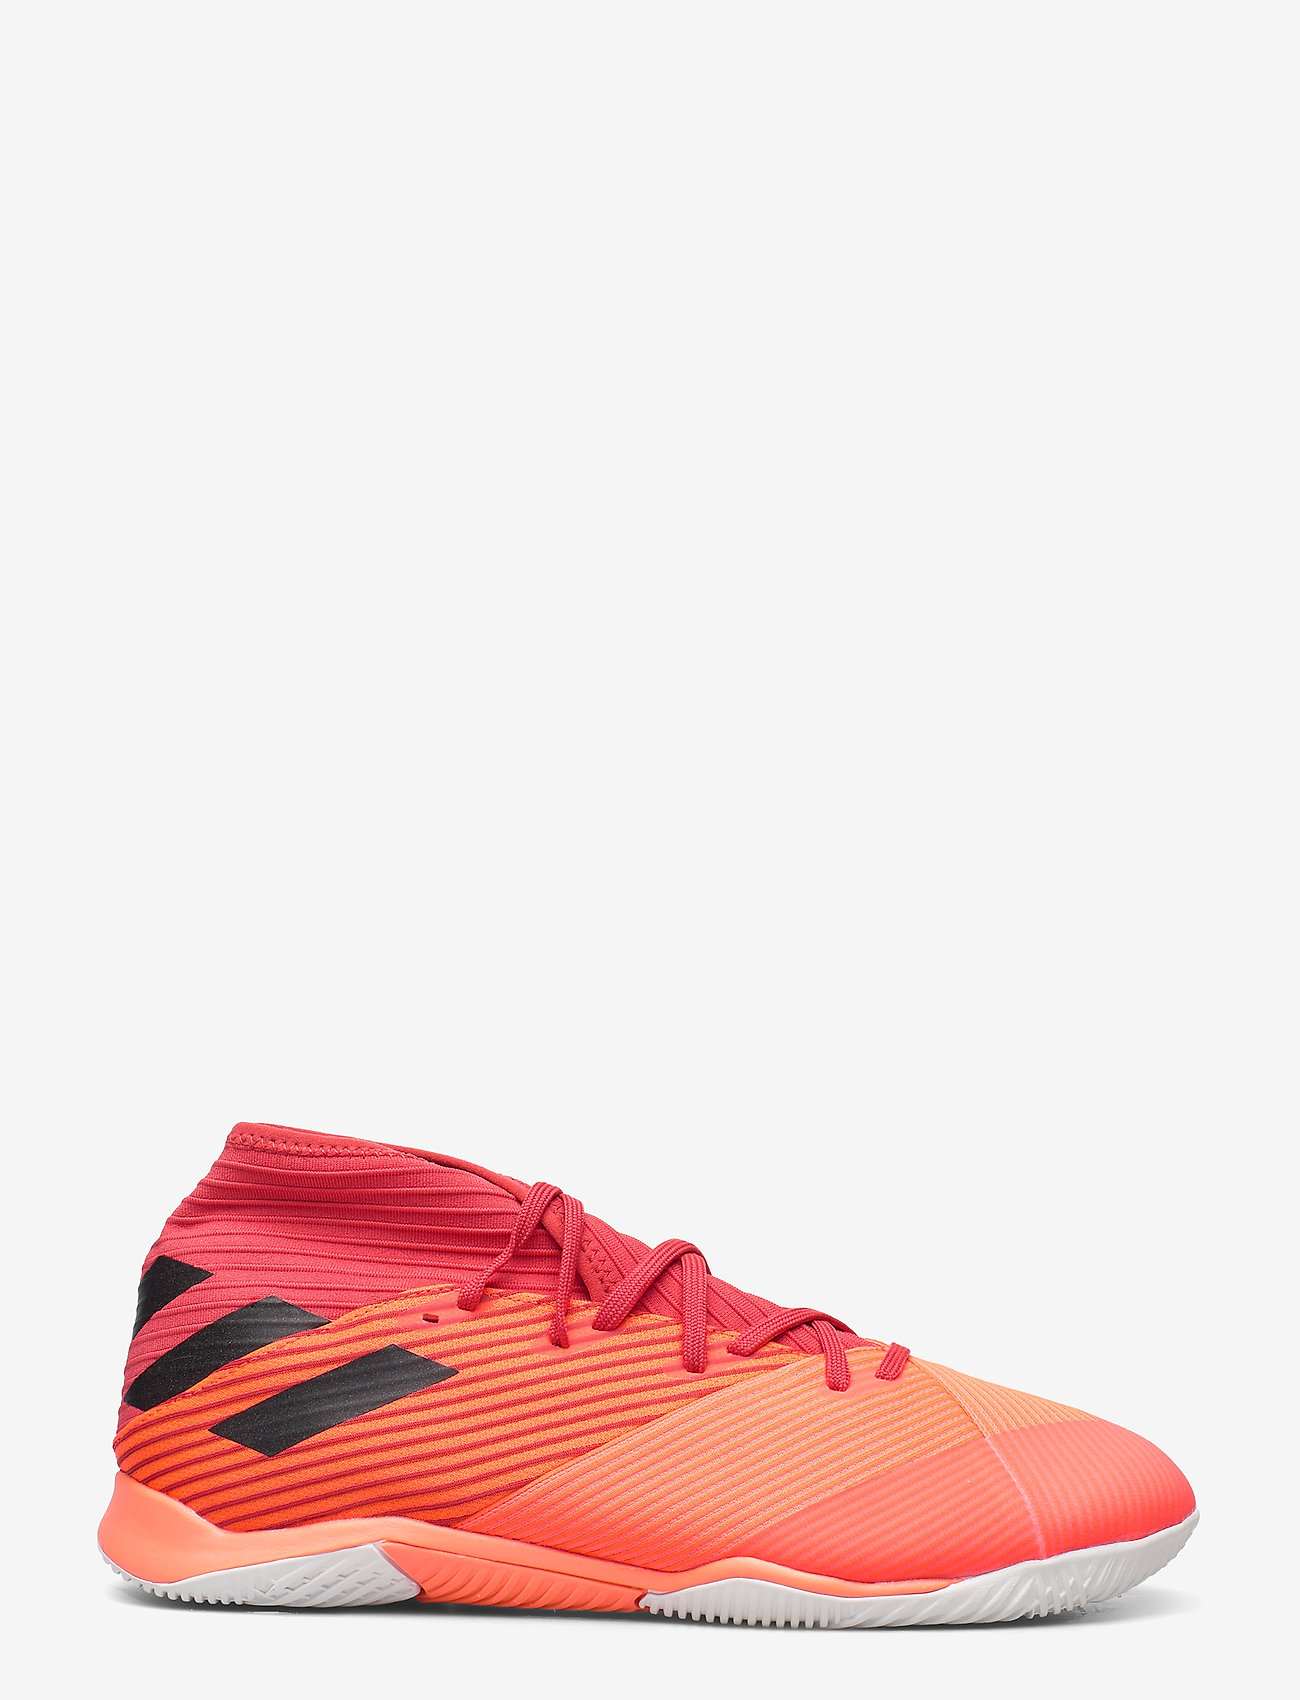 adidas Performance - NEMEZIZ 19.3 IN - fodboldsko - sigcor/cblack/glored - 1